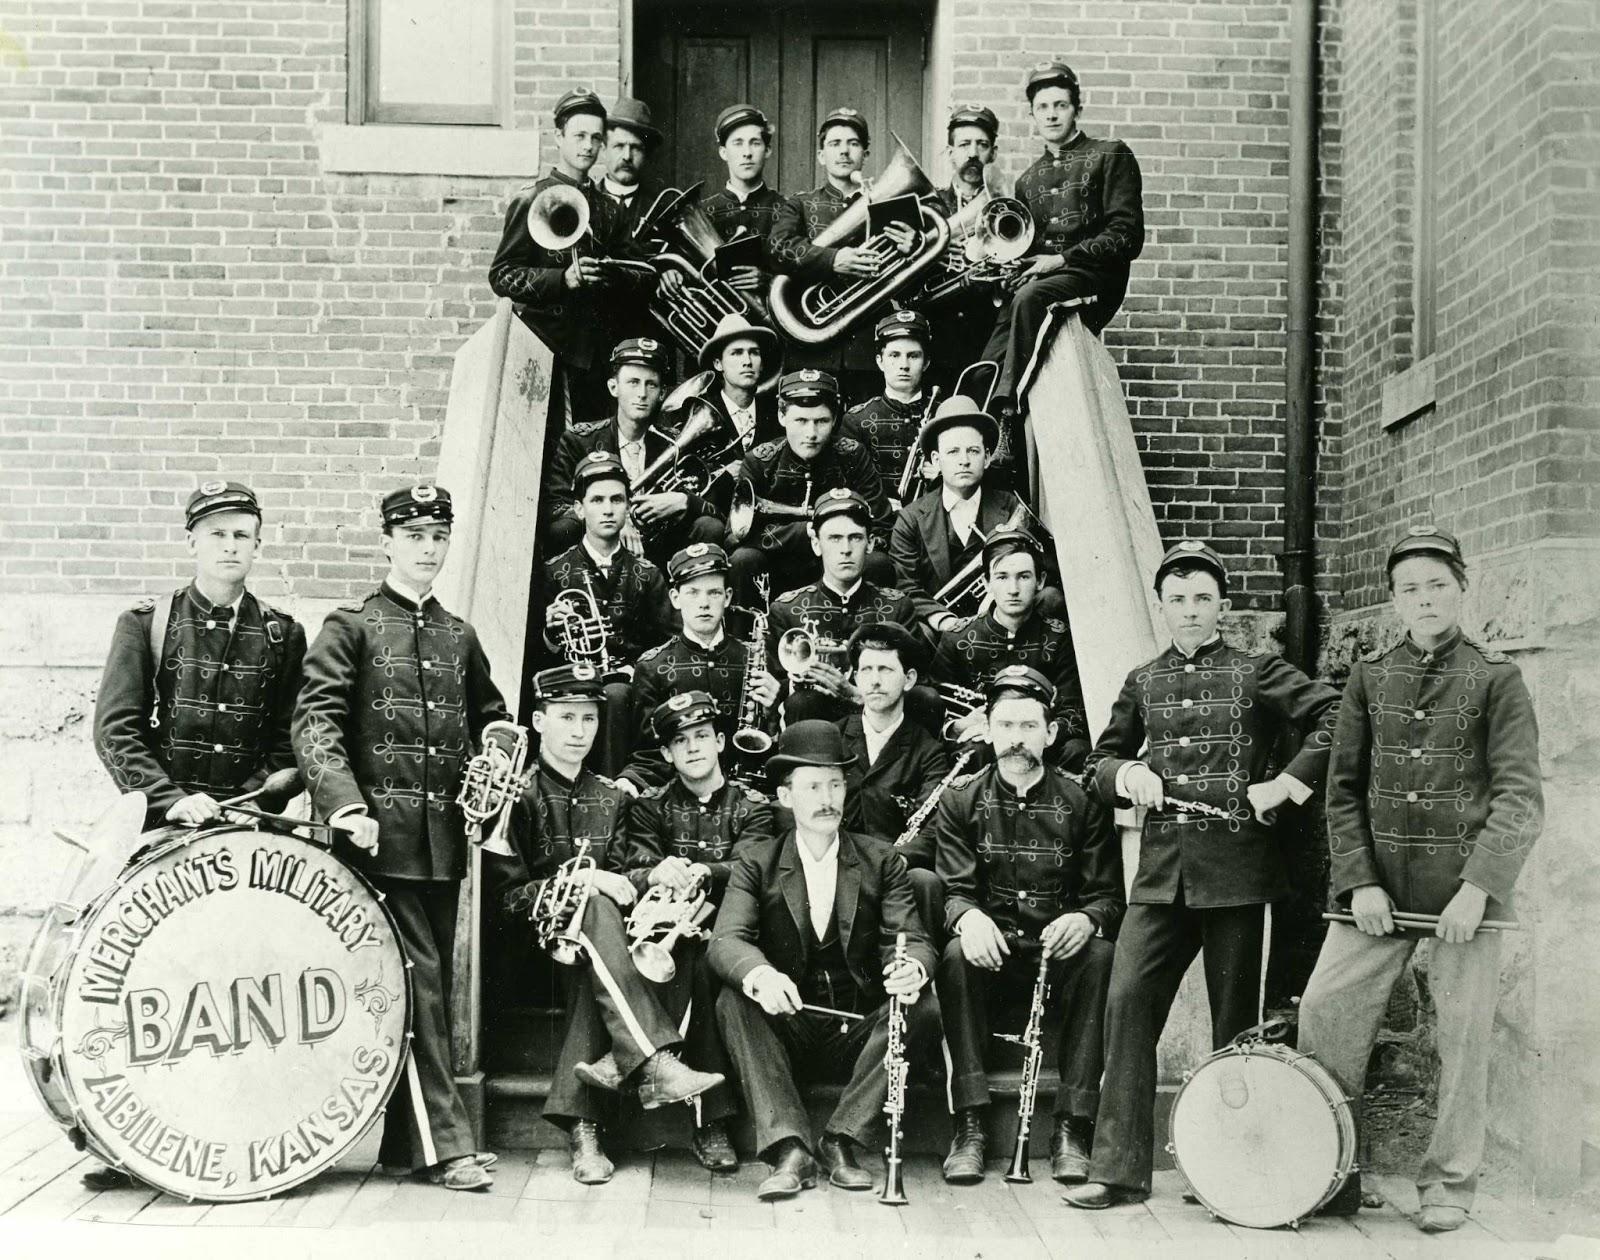 Kansas dickinson county abilene - Abilene Merchants Military Band In 1896